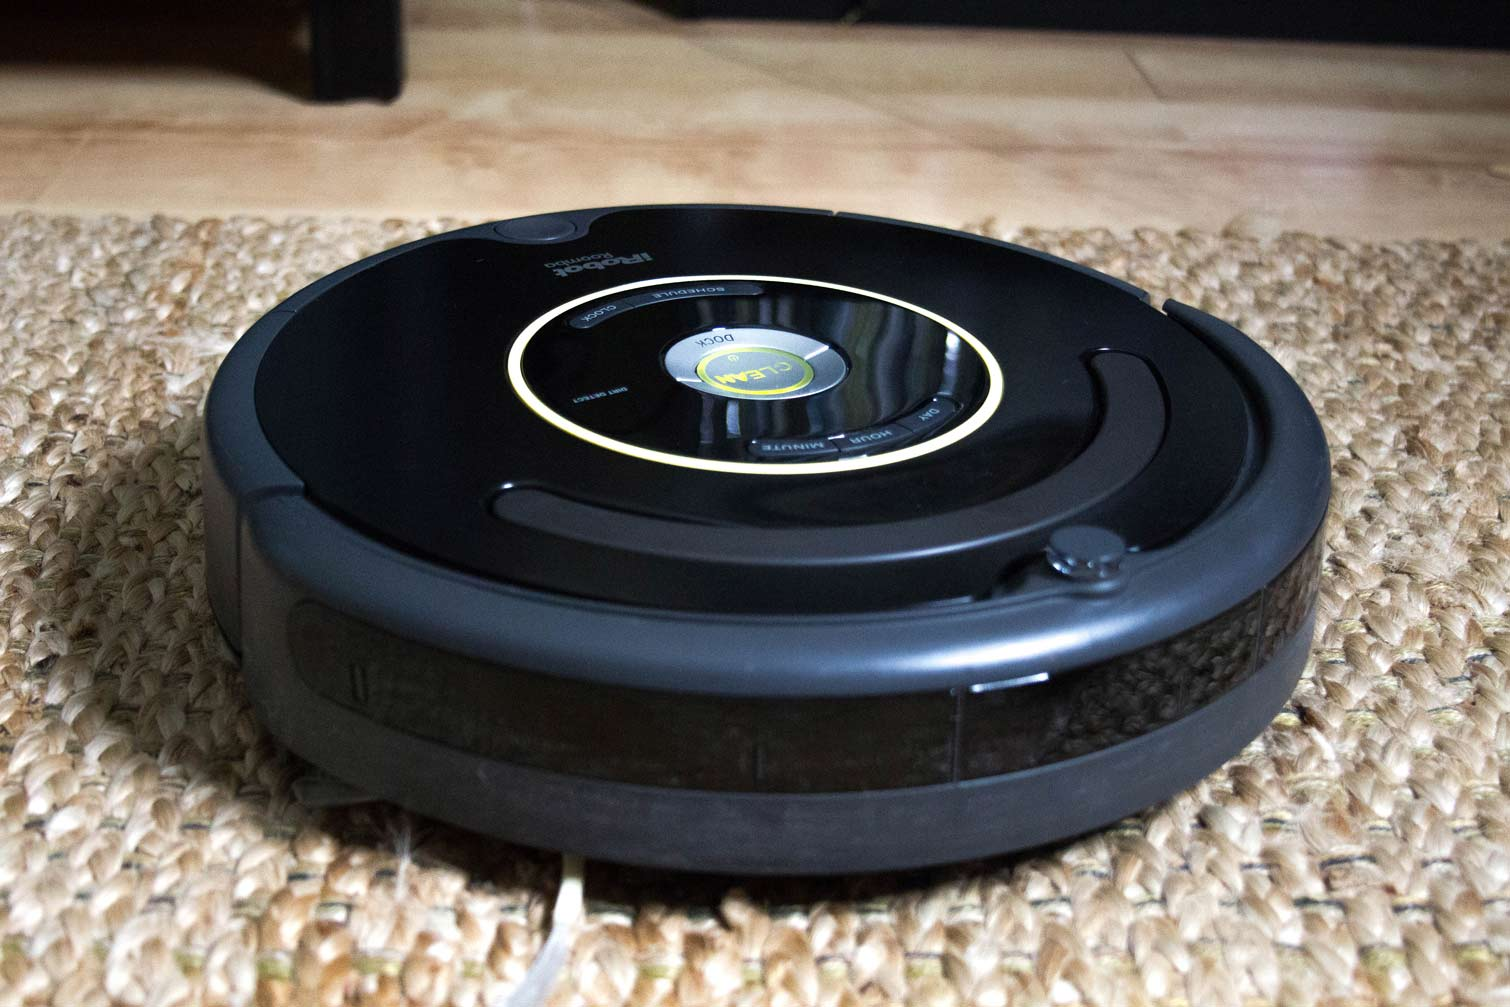 Irobot Roomba 650 Robot.Irobot Roomba 650 Review A Good Value Tom S Guide